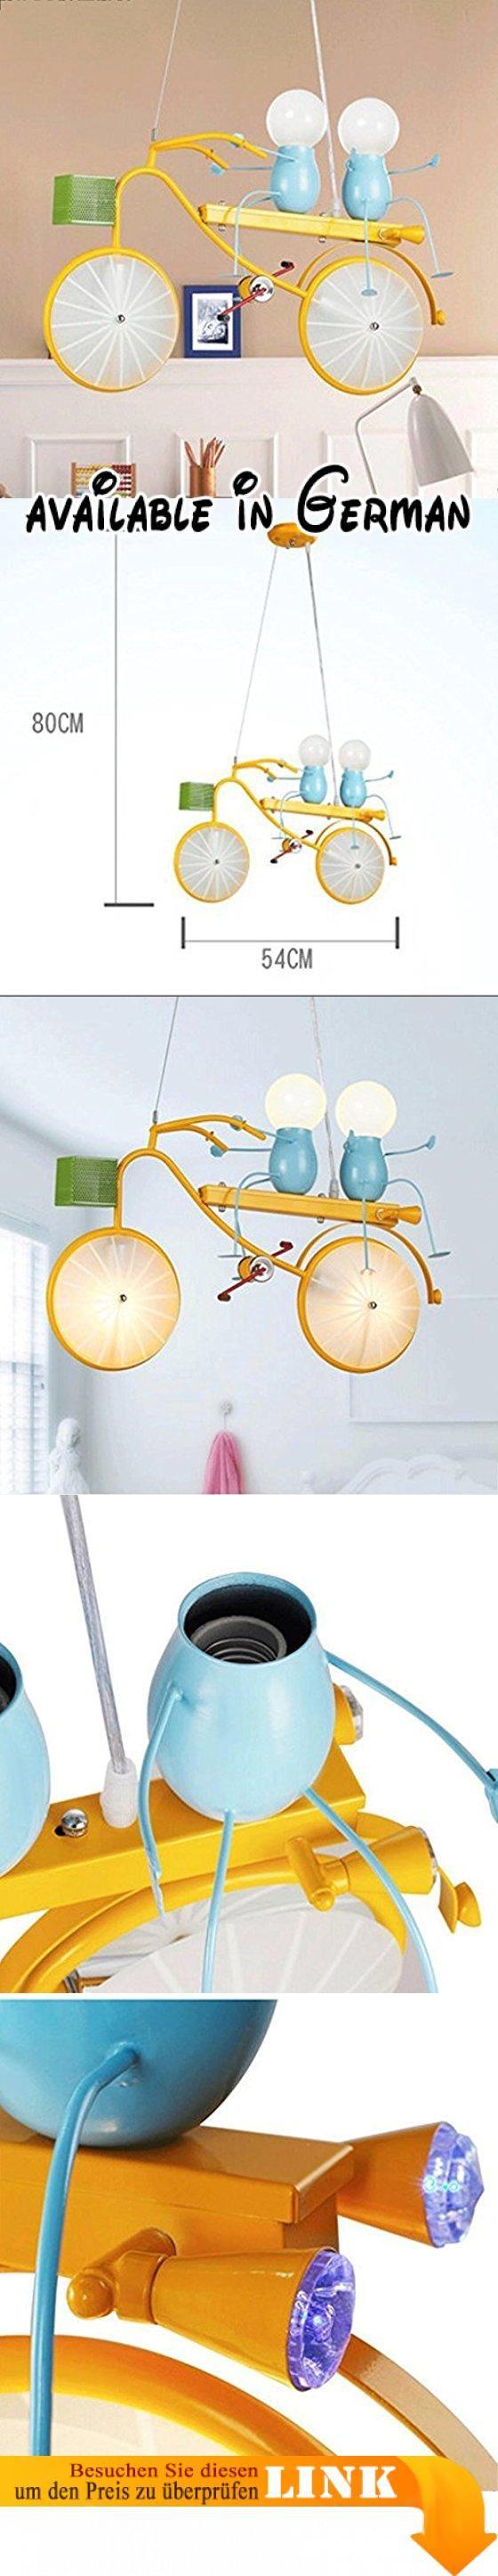 Fantastisch Kronleuchter Kronleuchter Kinder Kinder Lampen Schlafzimmer Junge Zimmer  Helle Und Moderne Einfache Cartoon Kreative Lampe E 27.. Ideale Dekorationu2026